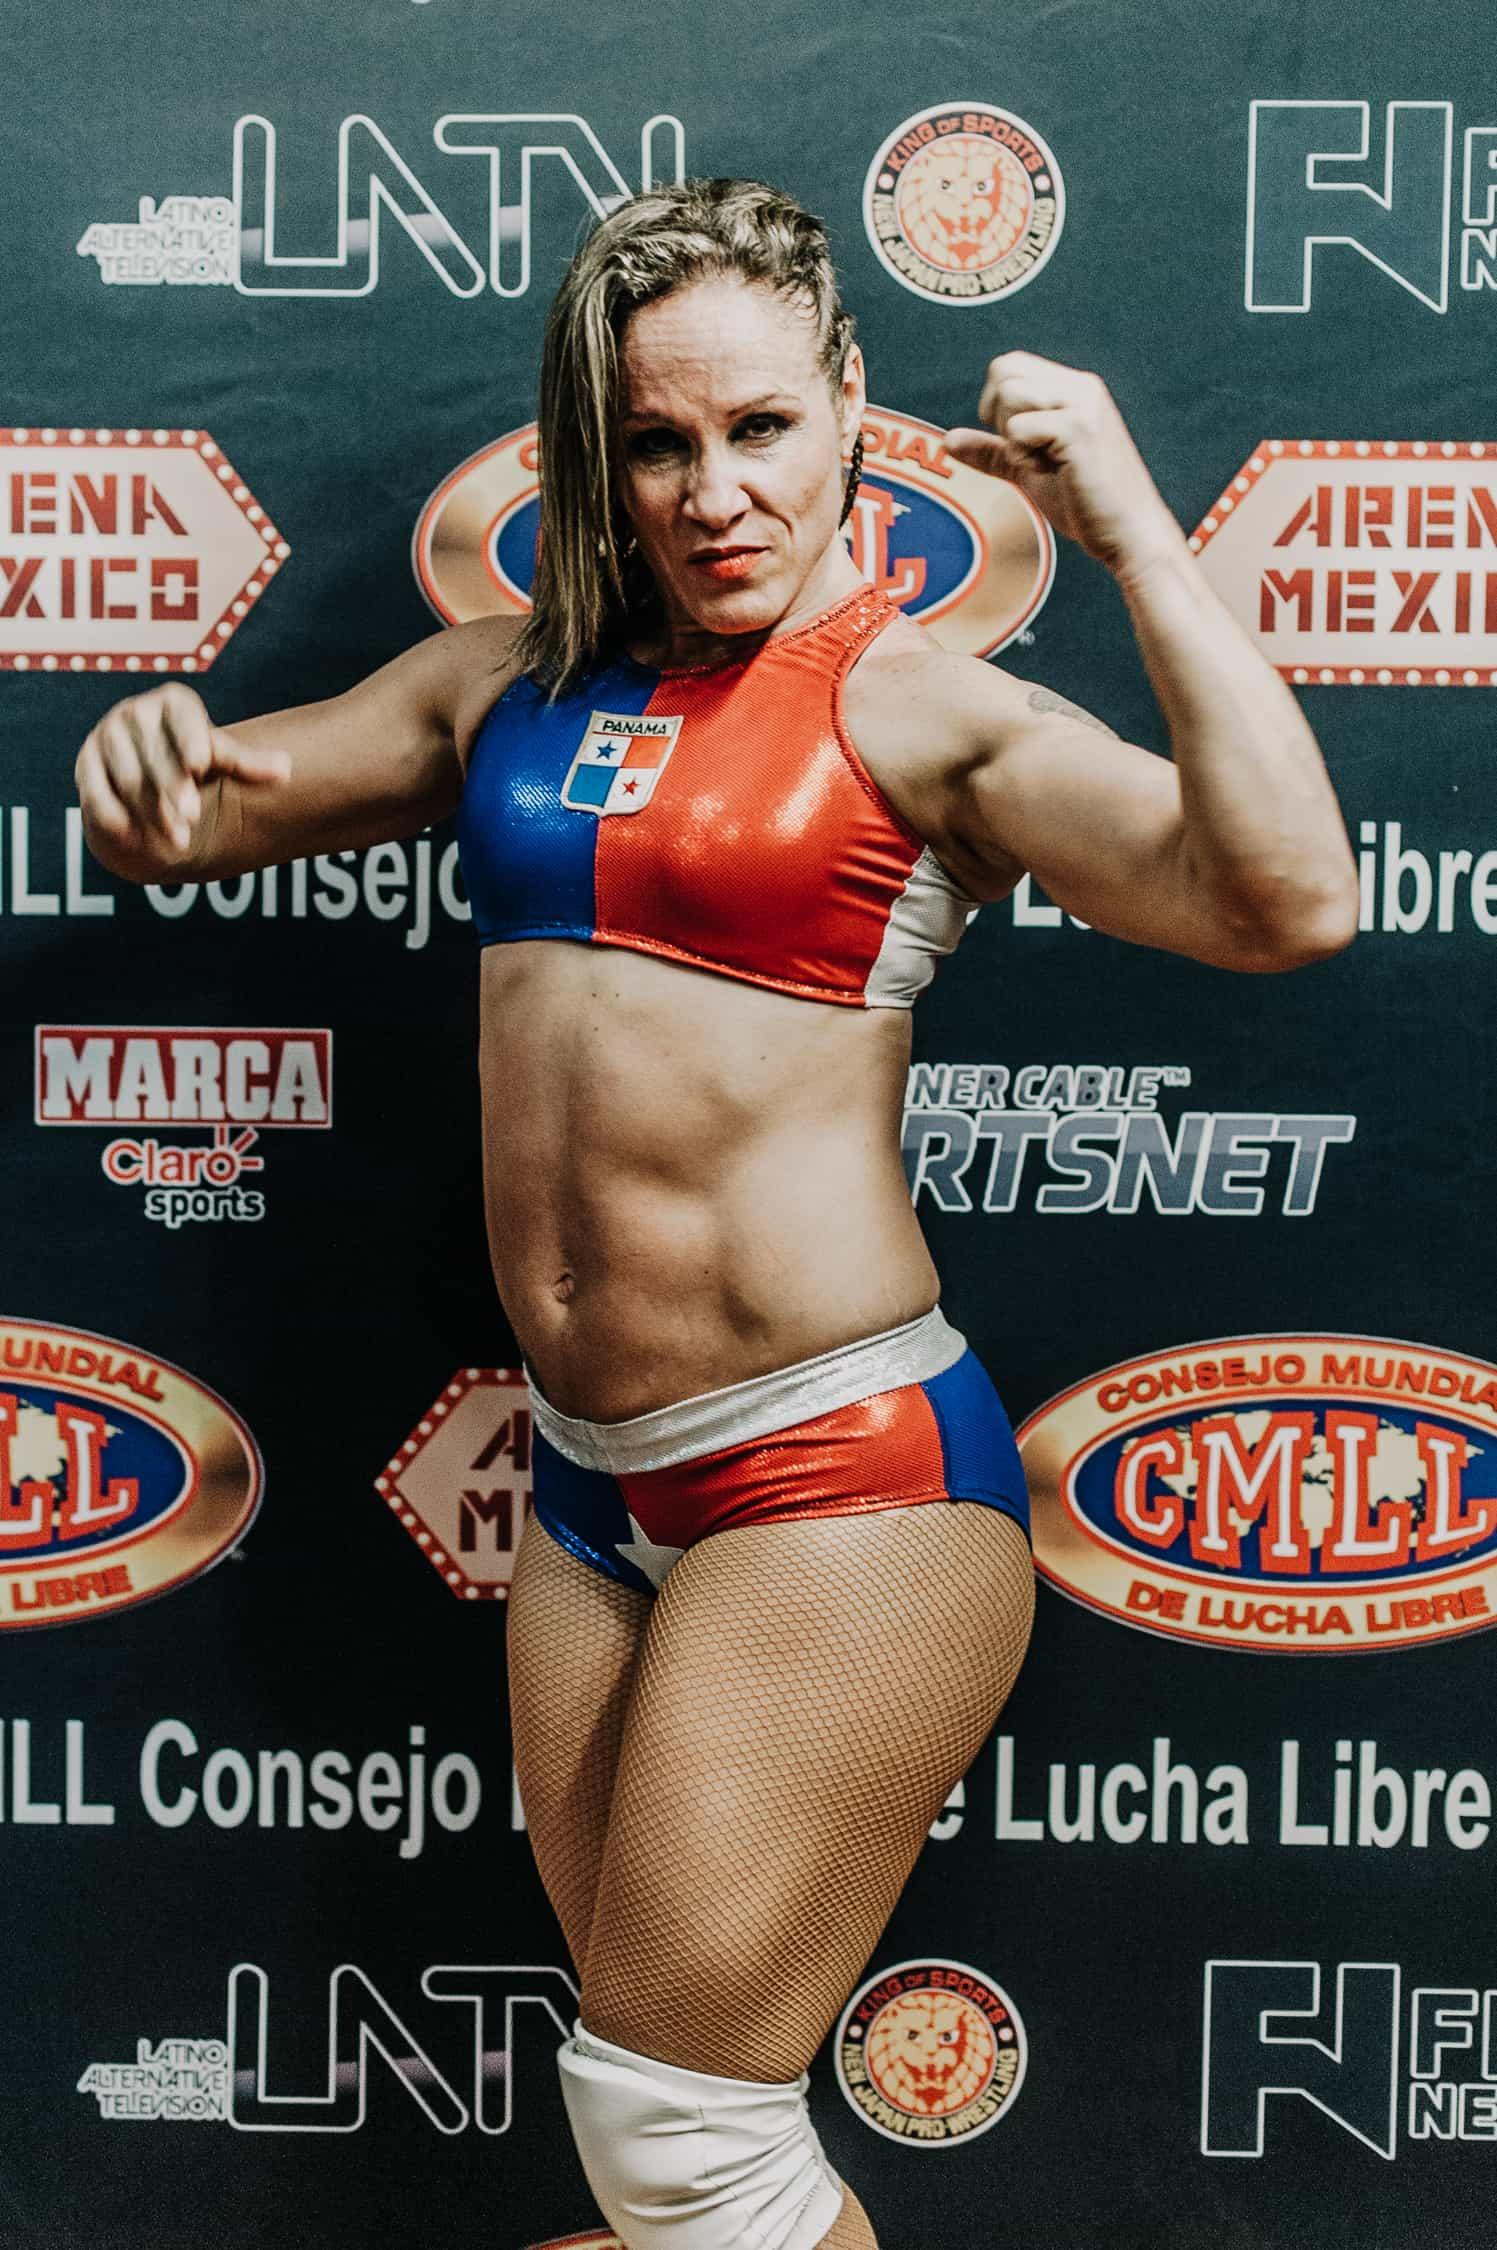 wrestler-mexiko-ansgar-dlugos-4